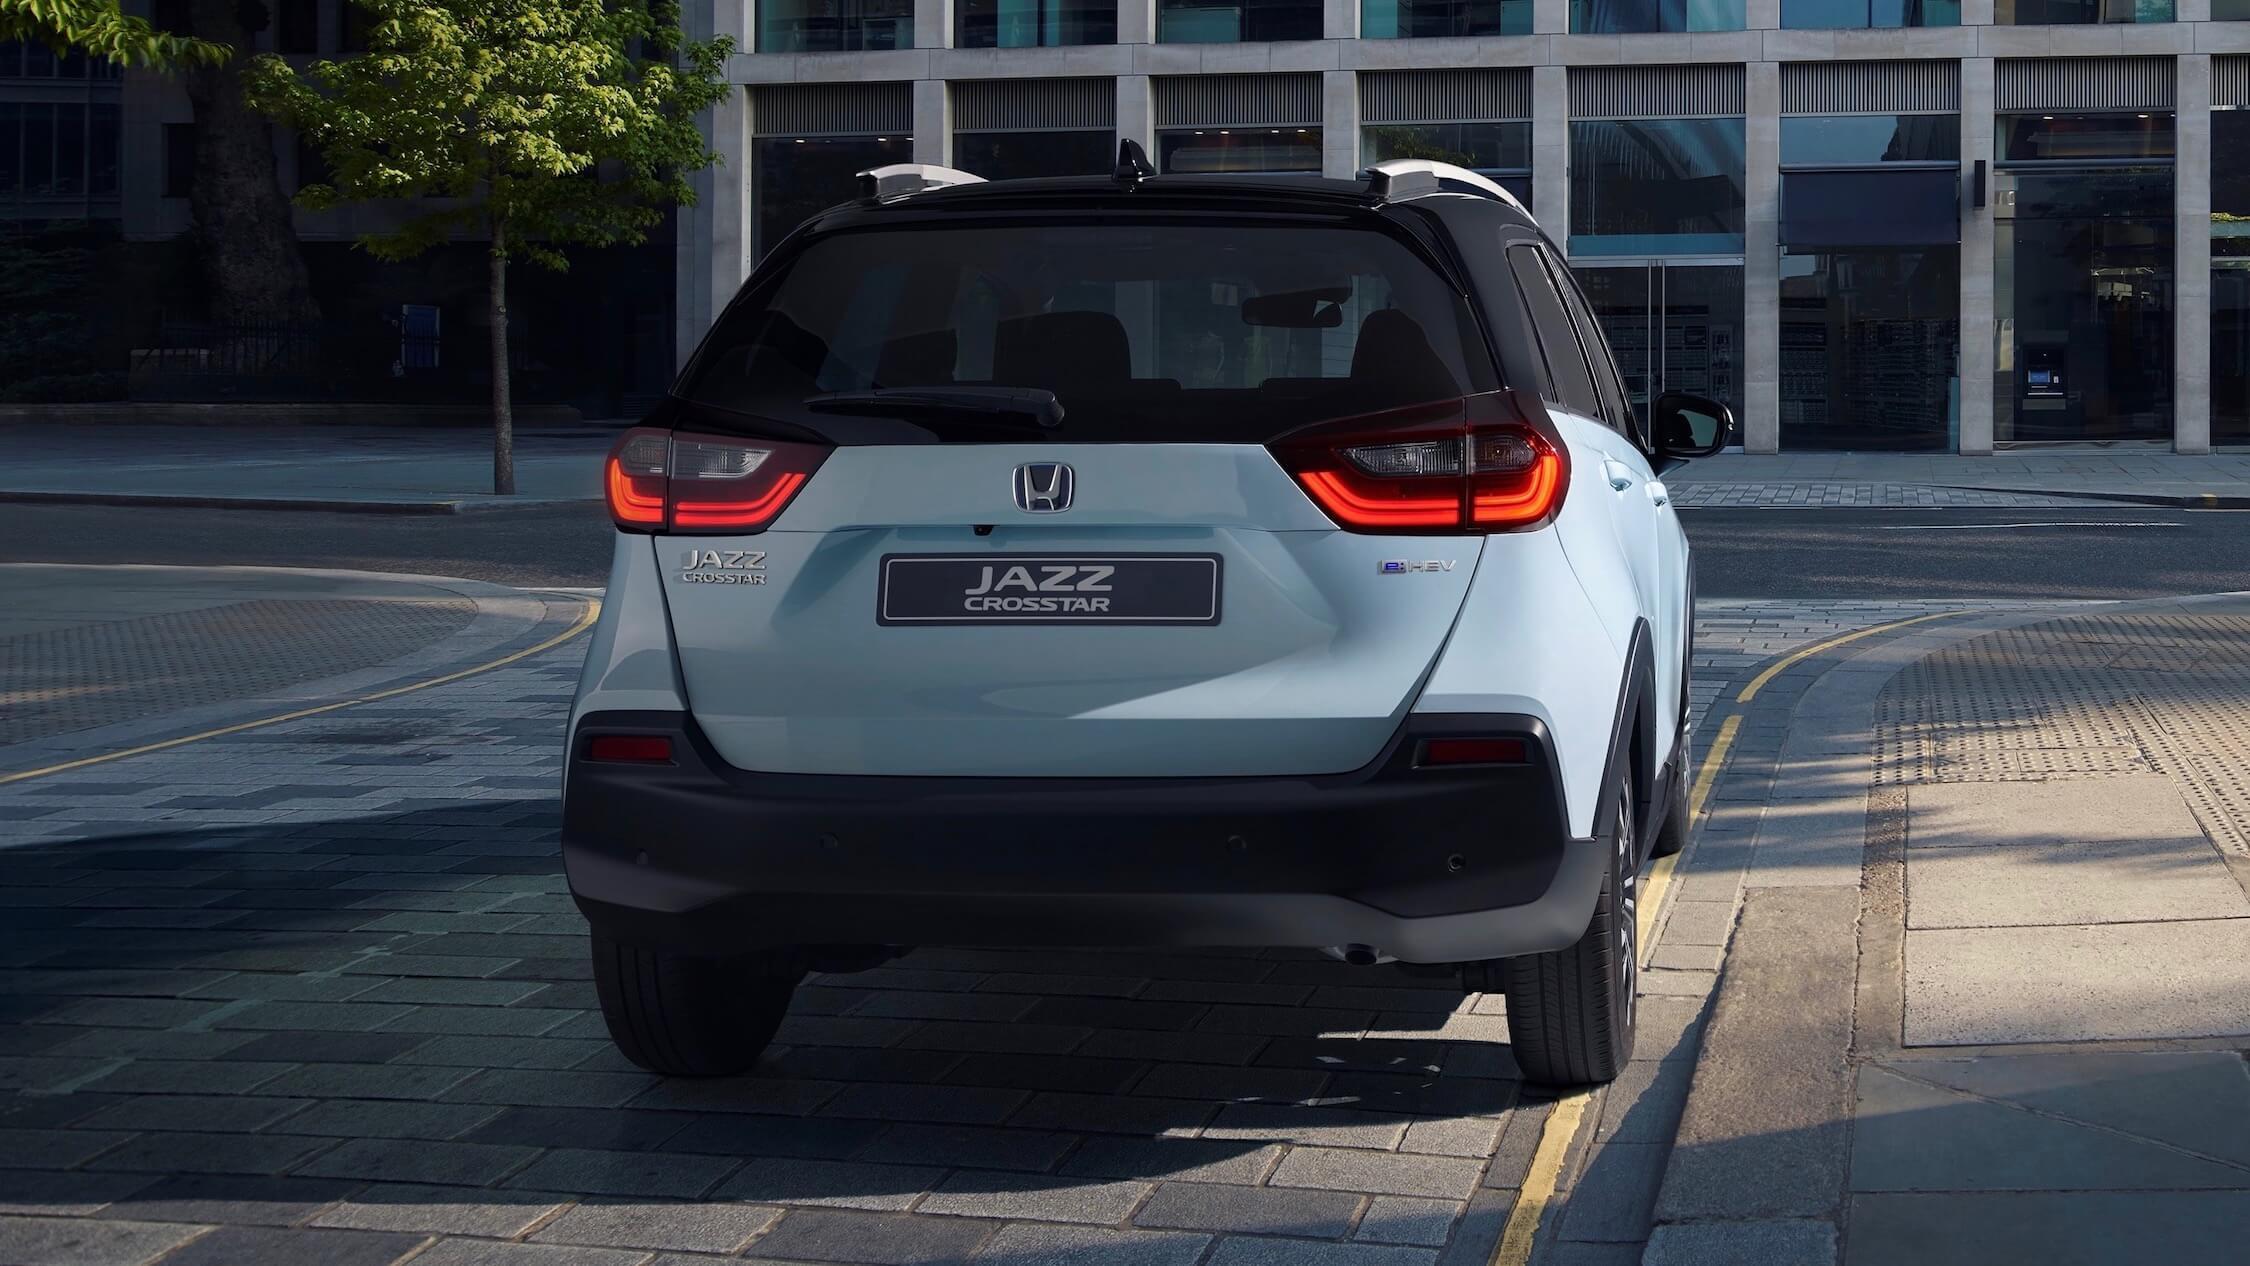 hybride Honda Jazz crosstar achterkant